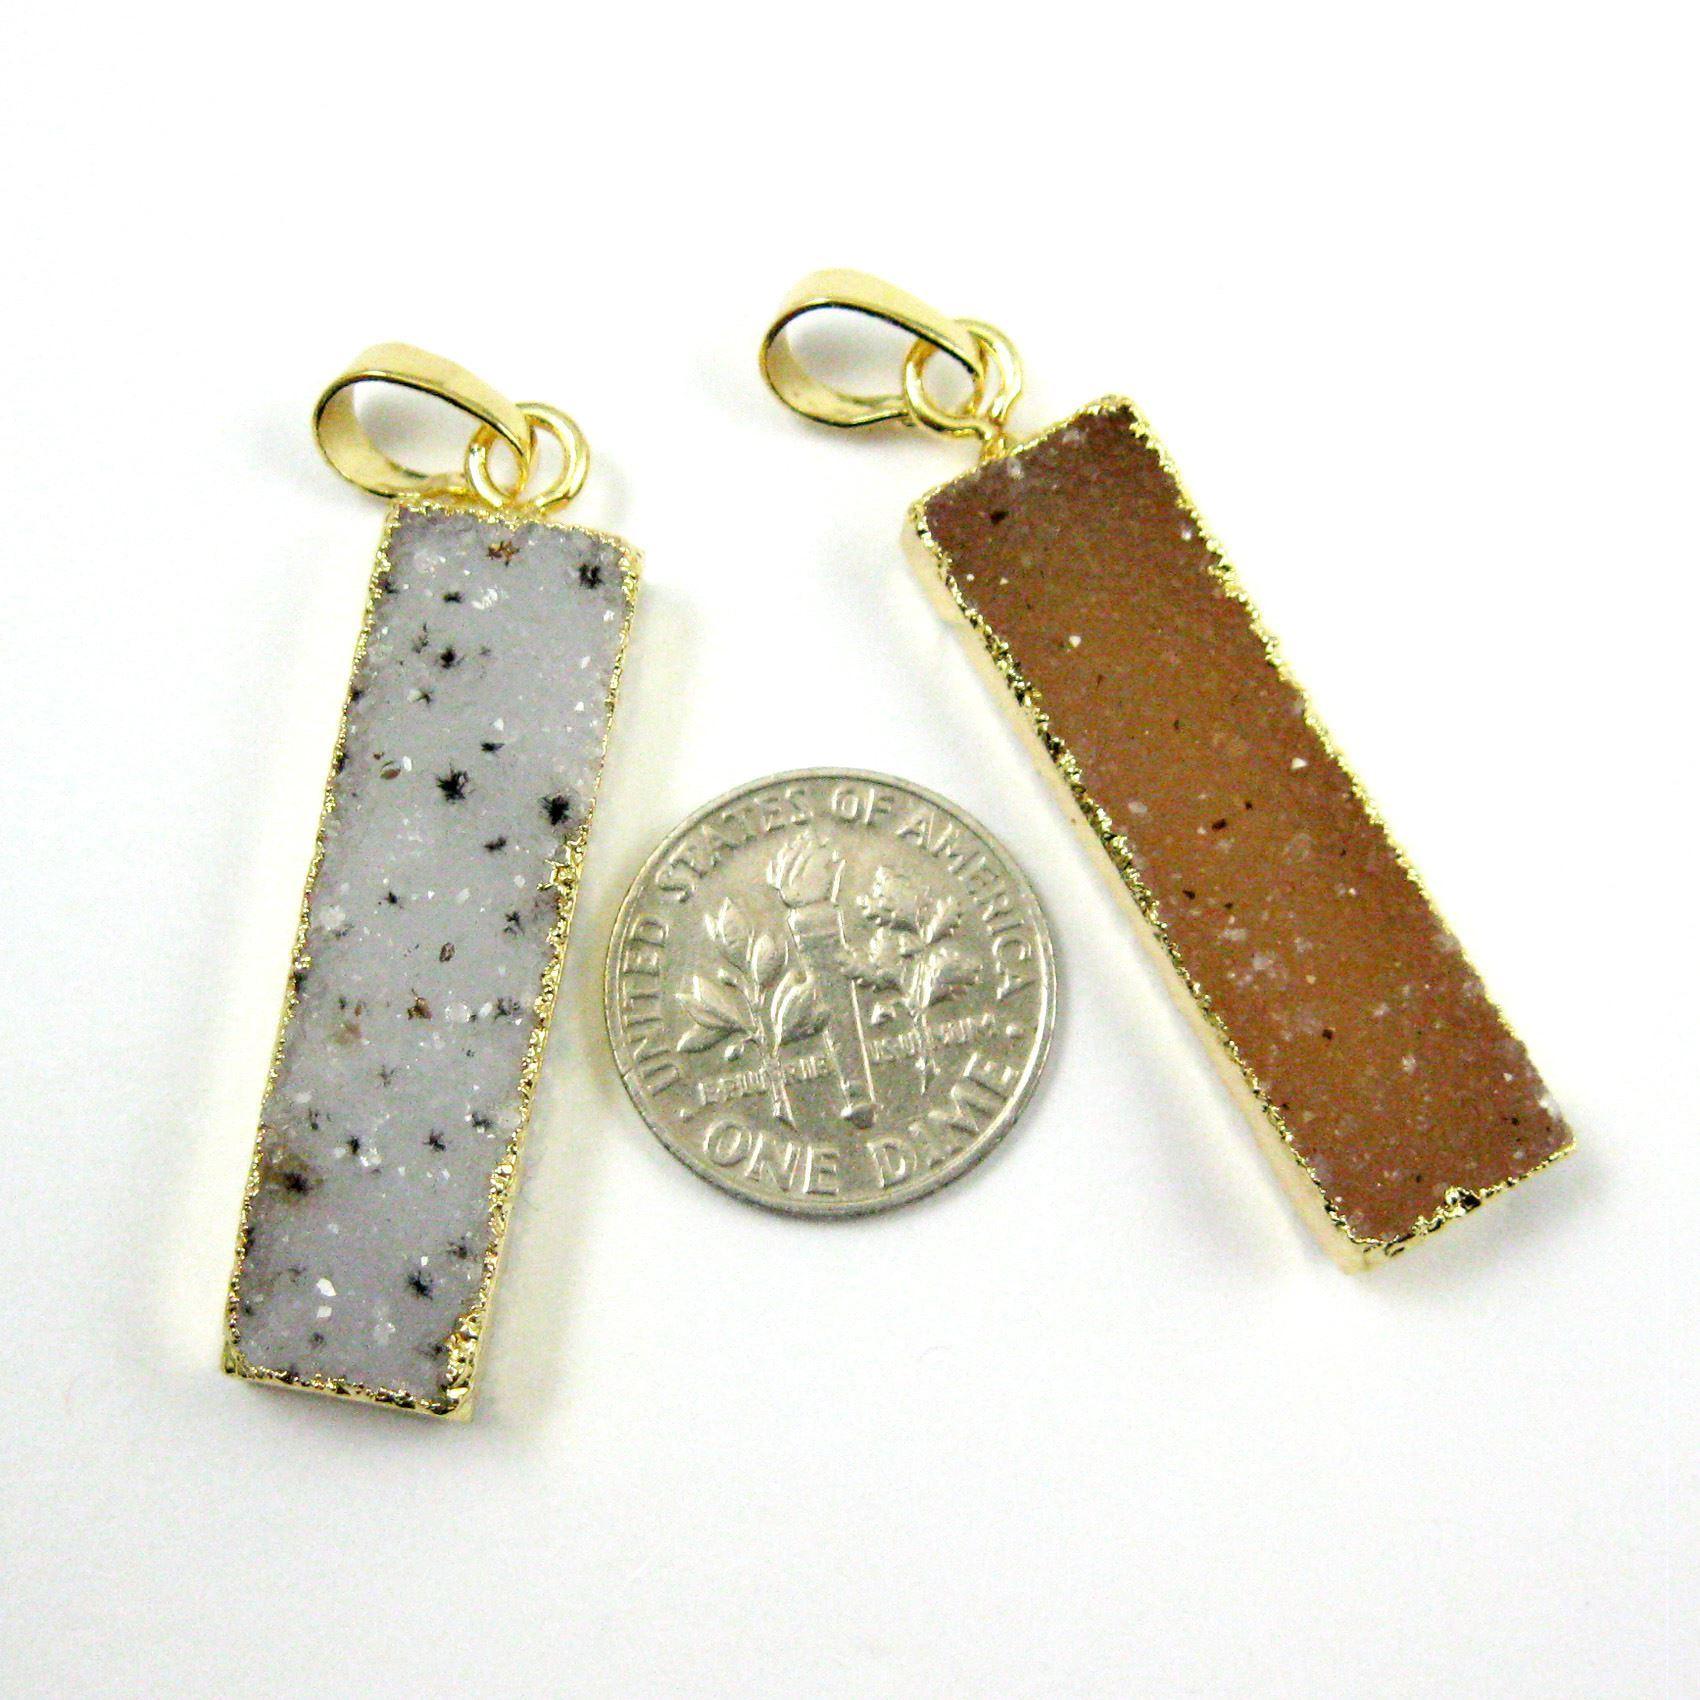 Natural Druzy Grey Speckled Agate Bar Pendant, 24K Gold plated Long Vertical Bar,Druzy Bar Necklace Rectangle Pendant